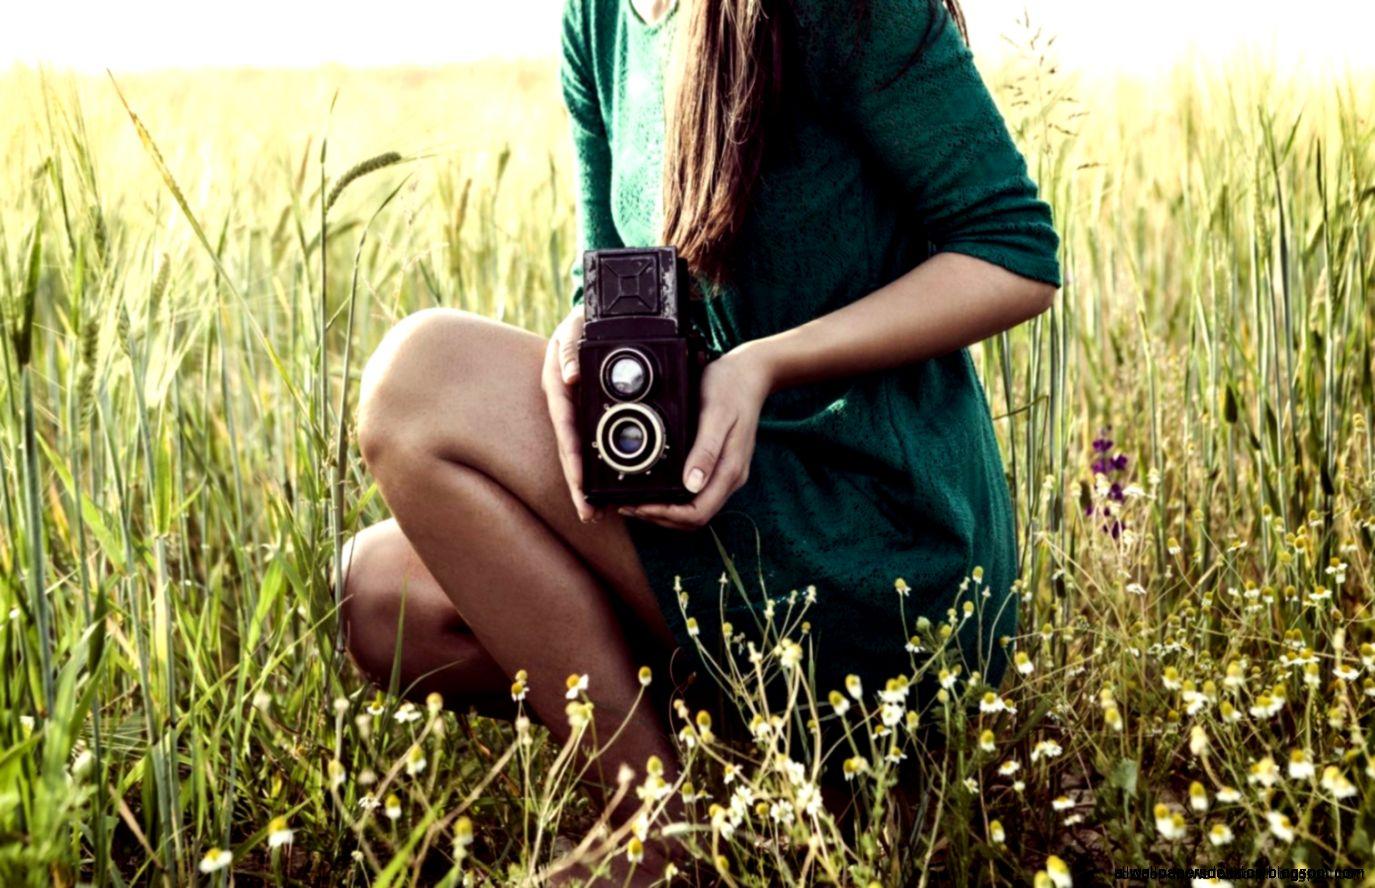 Mood Girl Camera Meadow Hd Wallpaper  Best Desktop Wallpapers